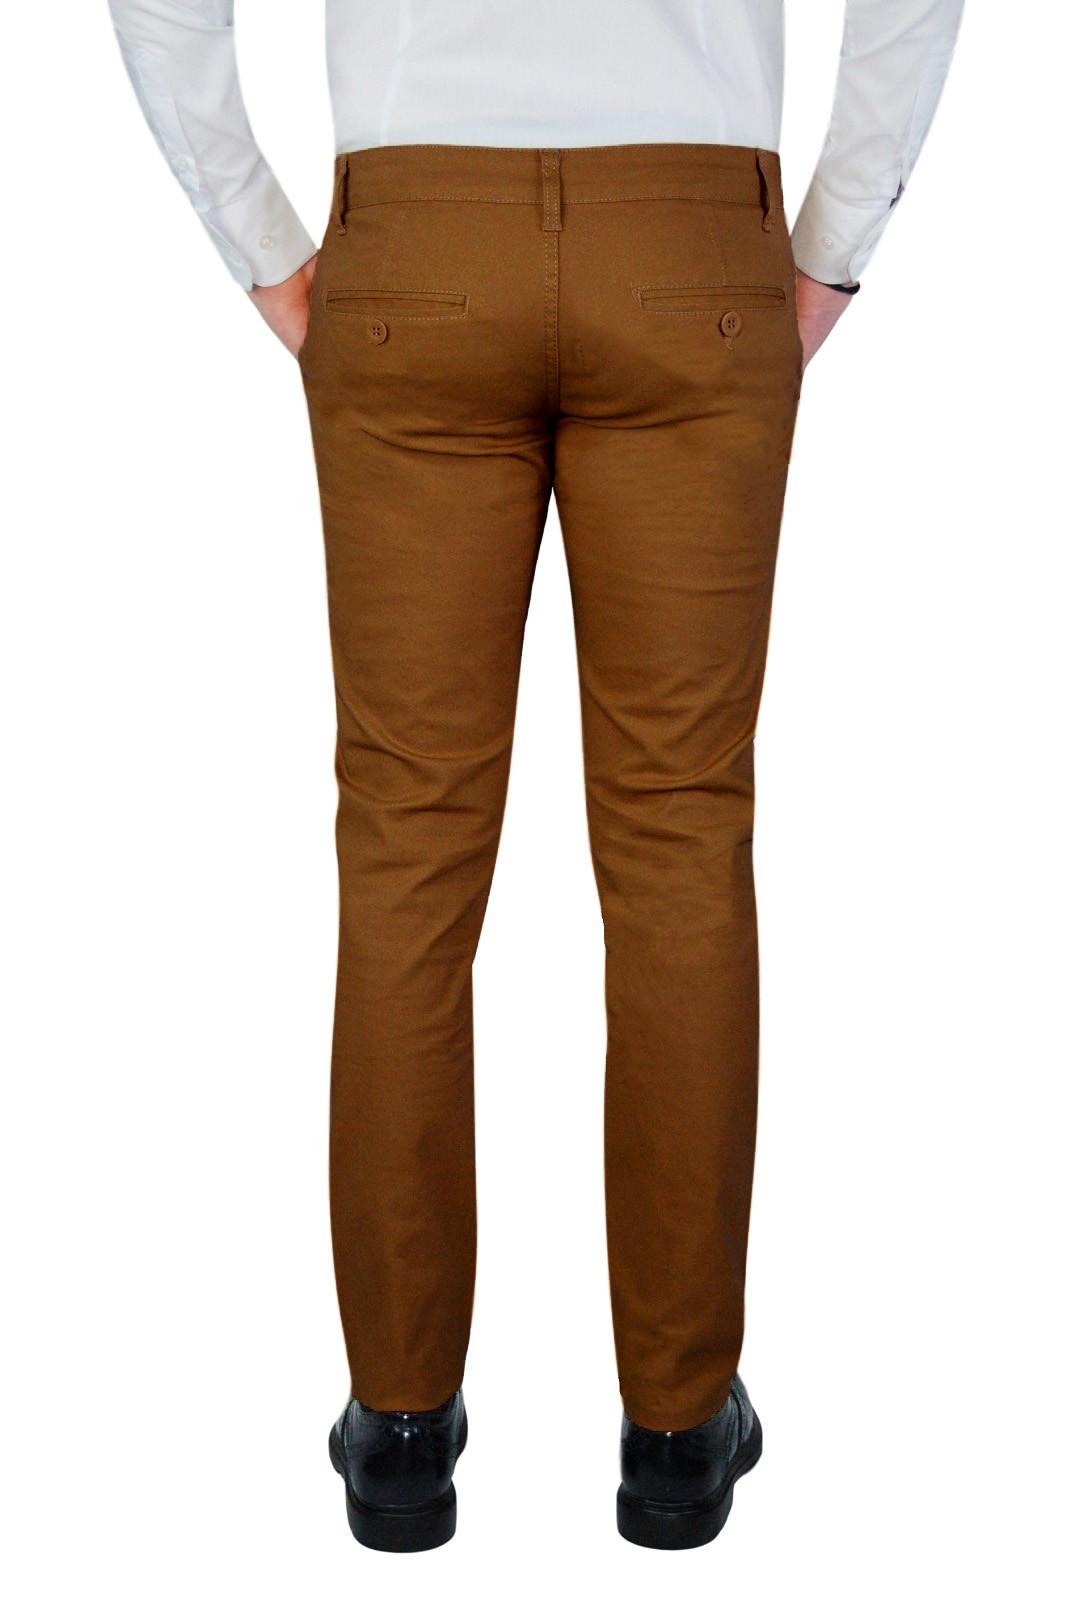 Pantalone-Uomo-Slim-Fit-Chino-Invernale-tasca-america-Cotone-Blu-Nero-Verde miniatura 29